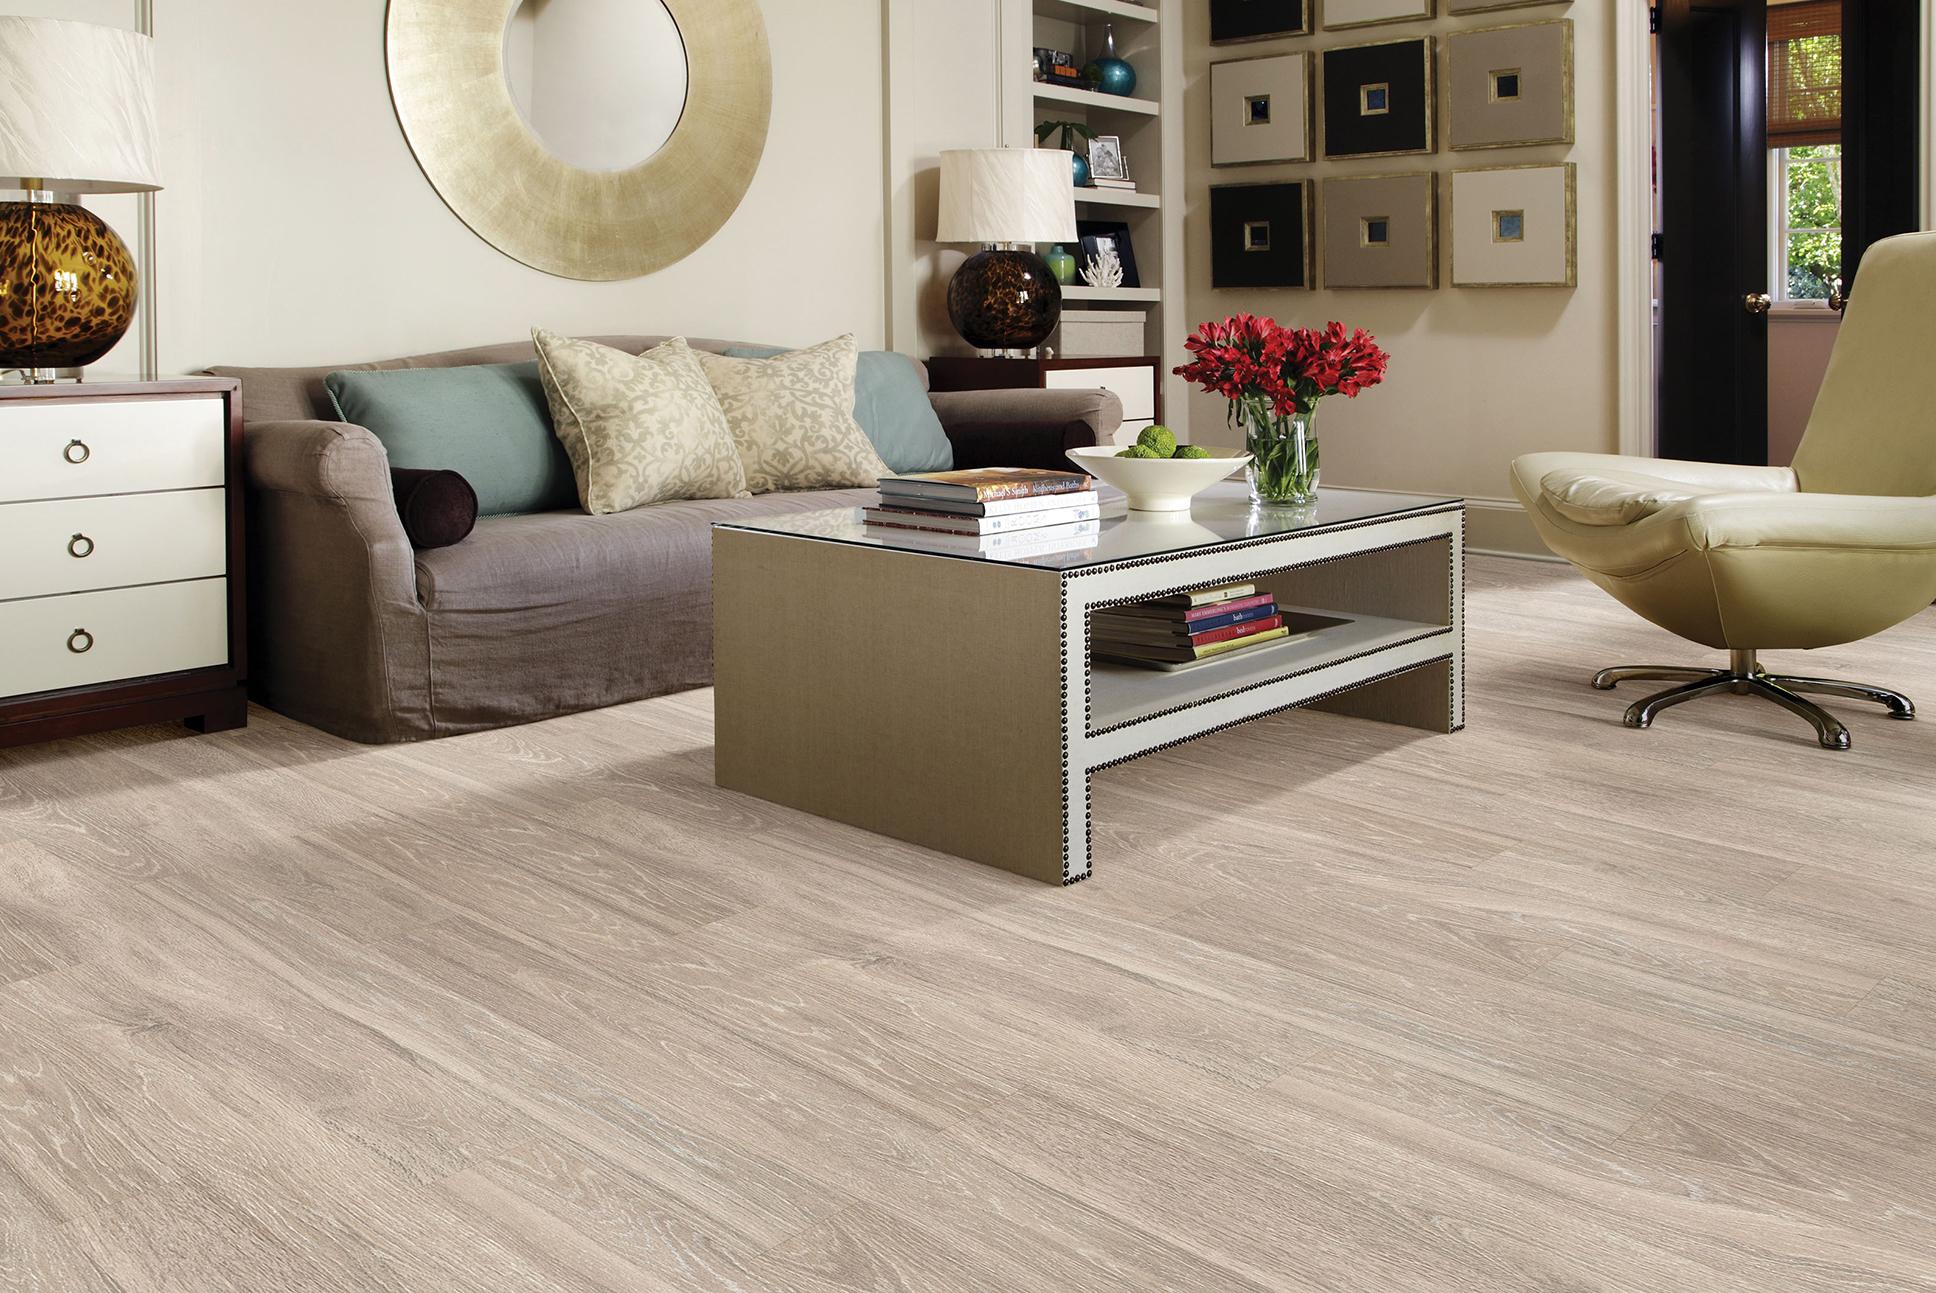 Laminate Flooring and Versatility